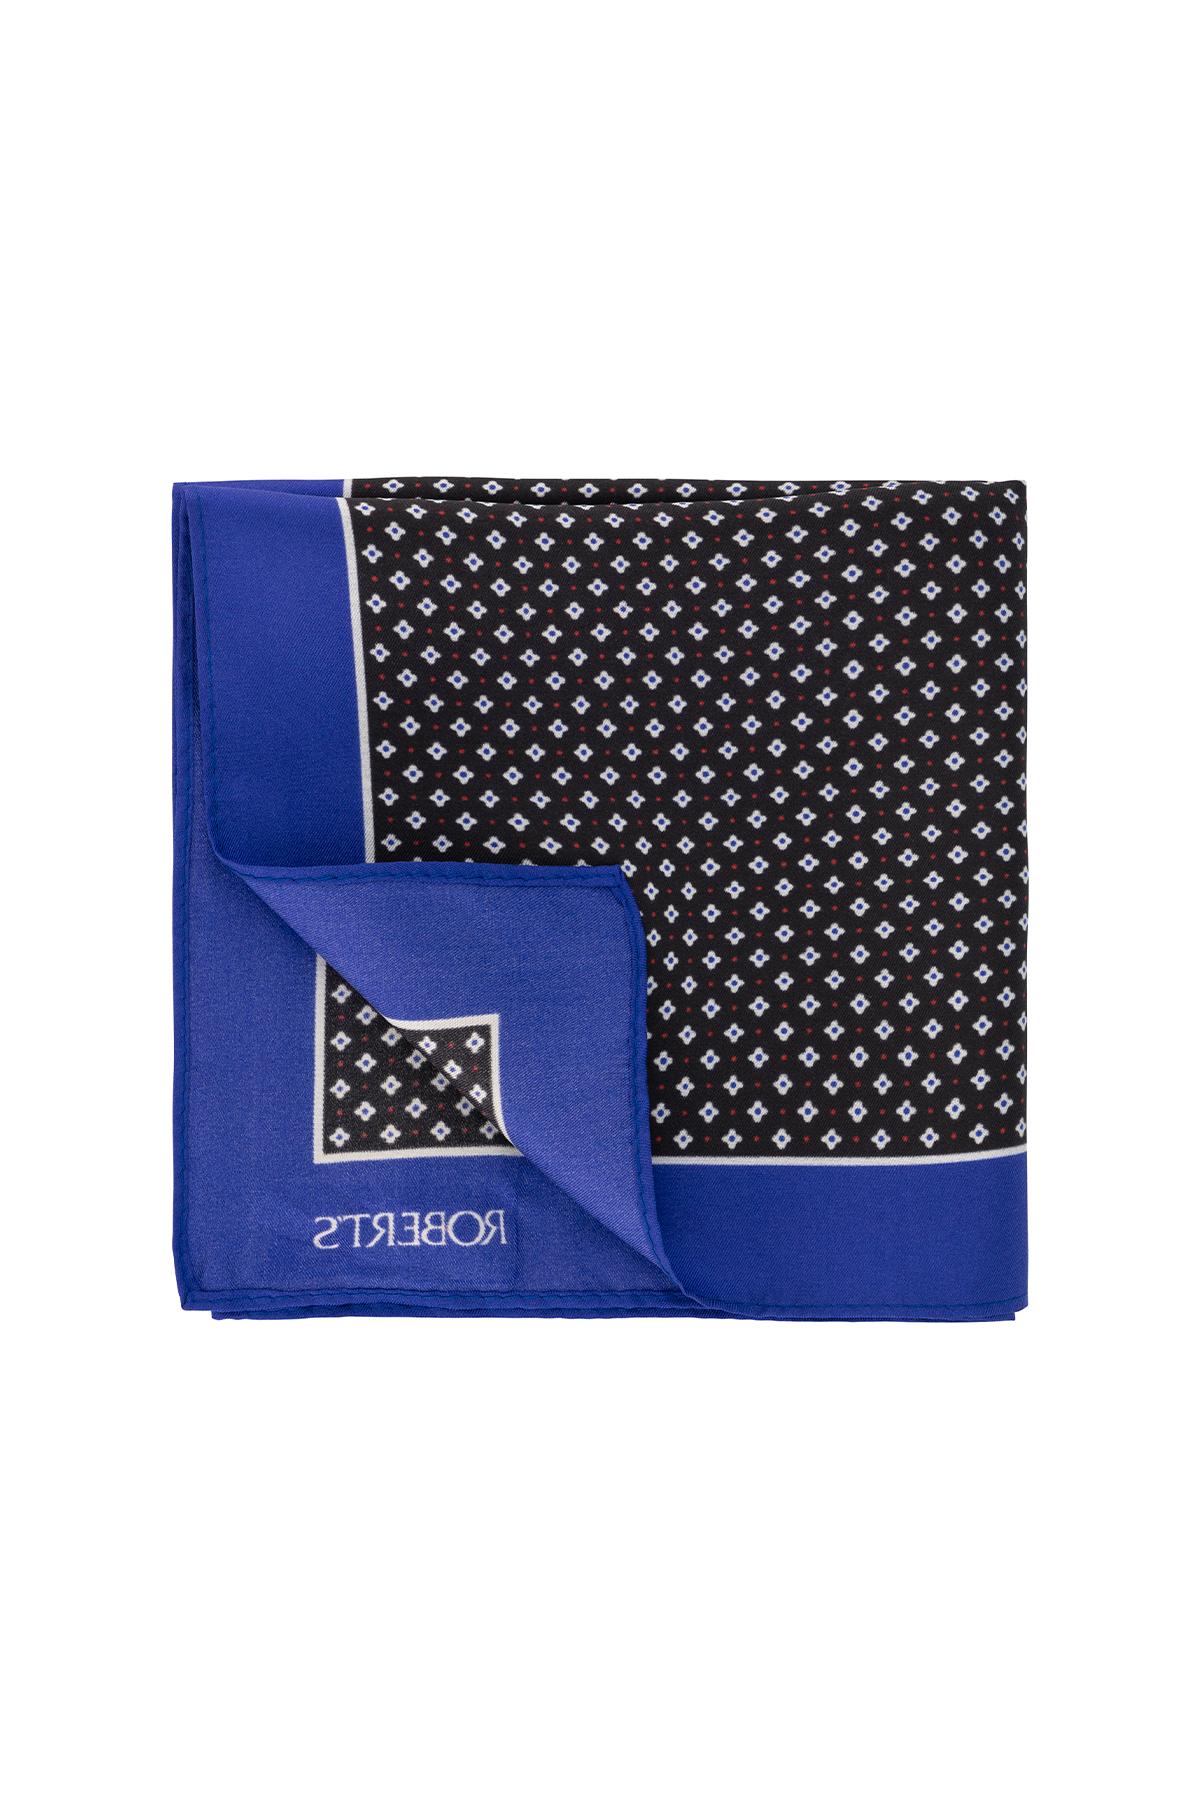 Pañuelo marca Robert´s color negro floral .